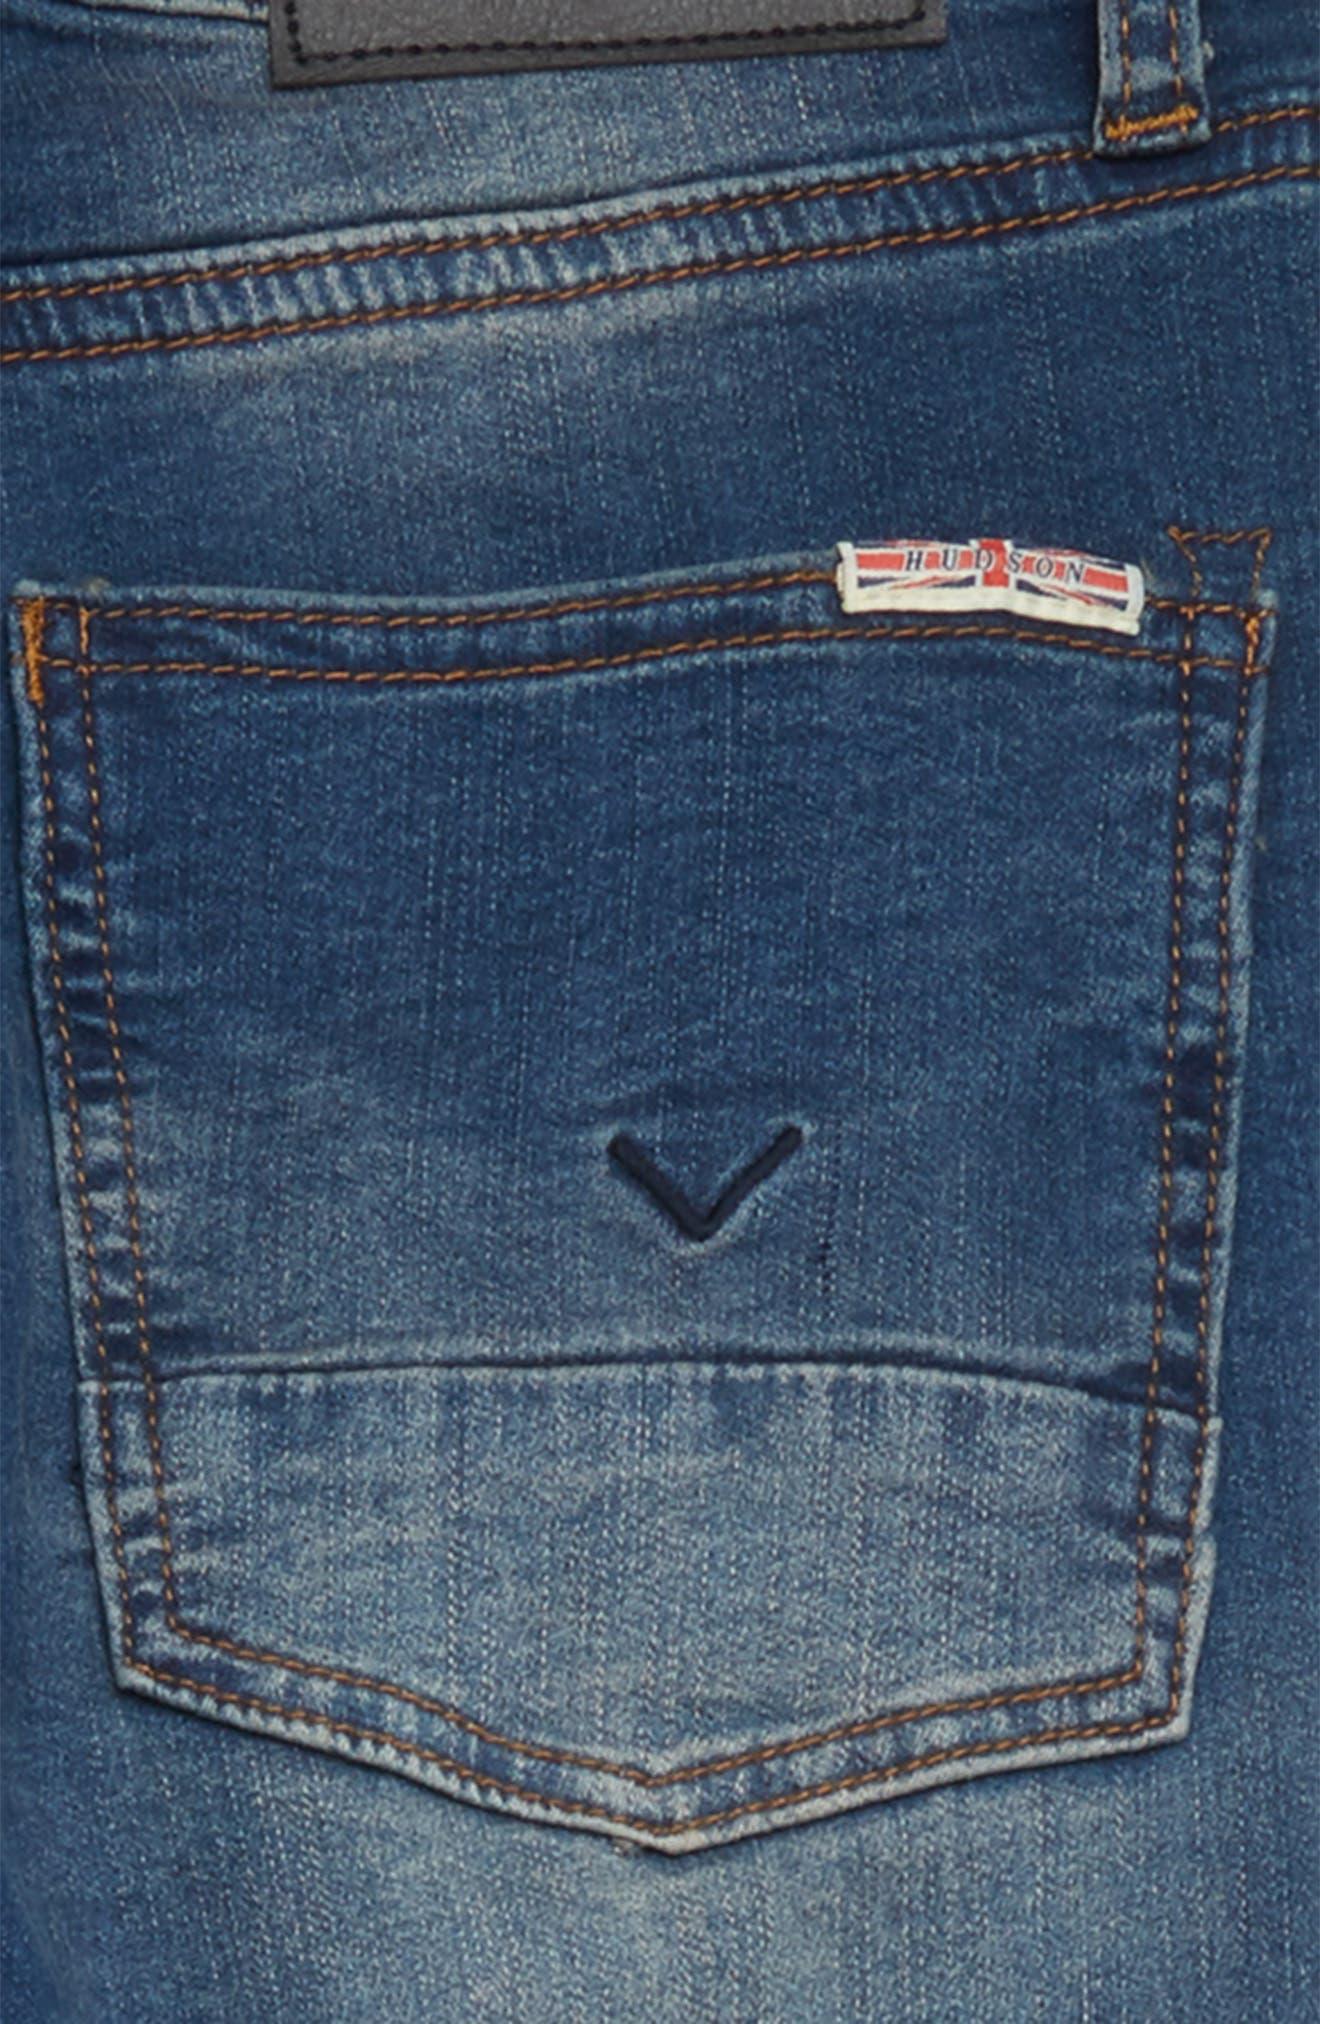 Jagger Slim Fit Straight Leg Jeans,                             Alternate thumbnail 3, color,                             458